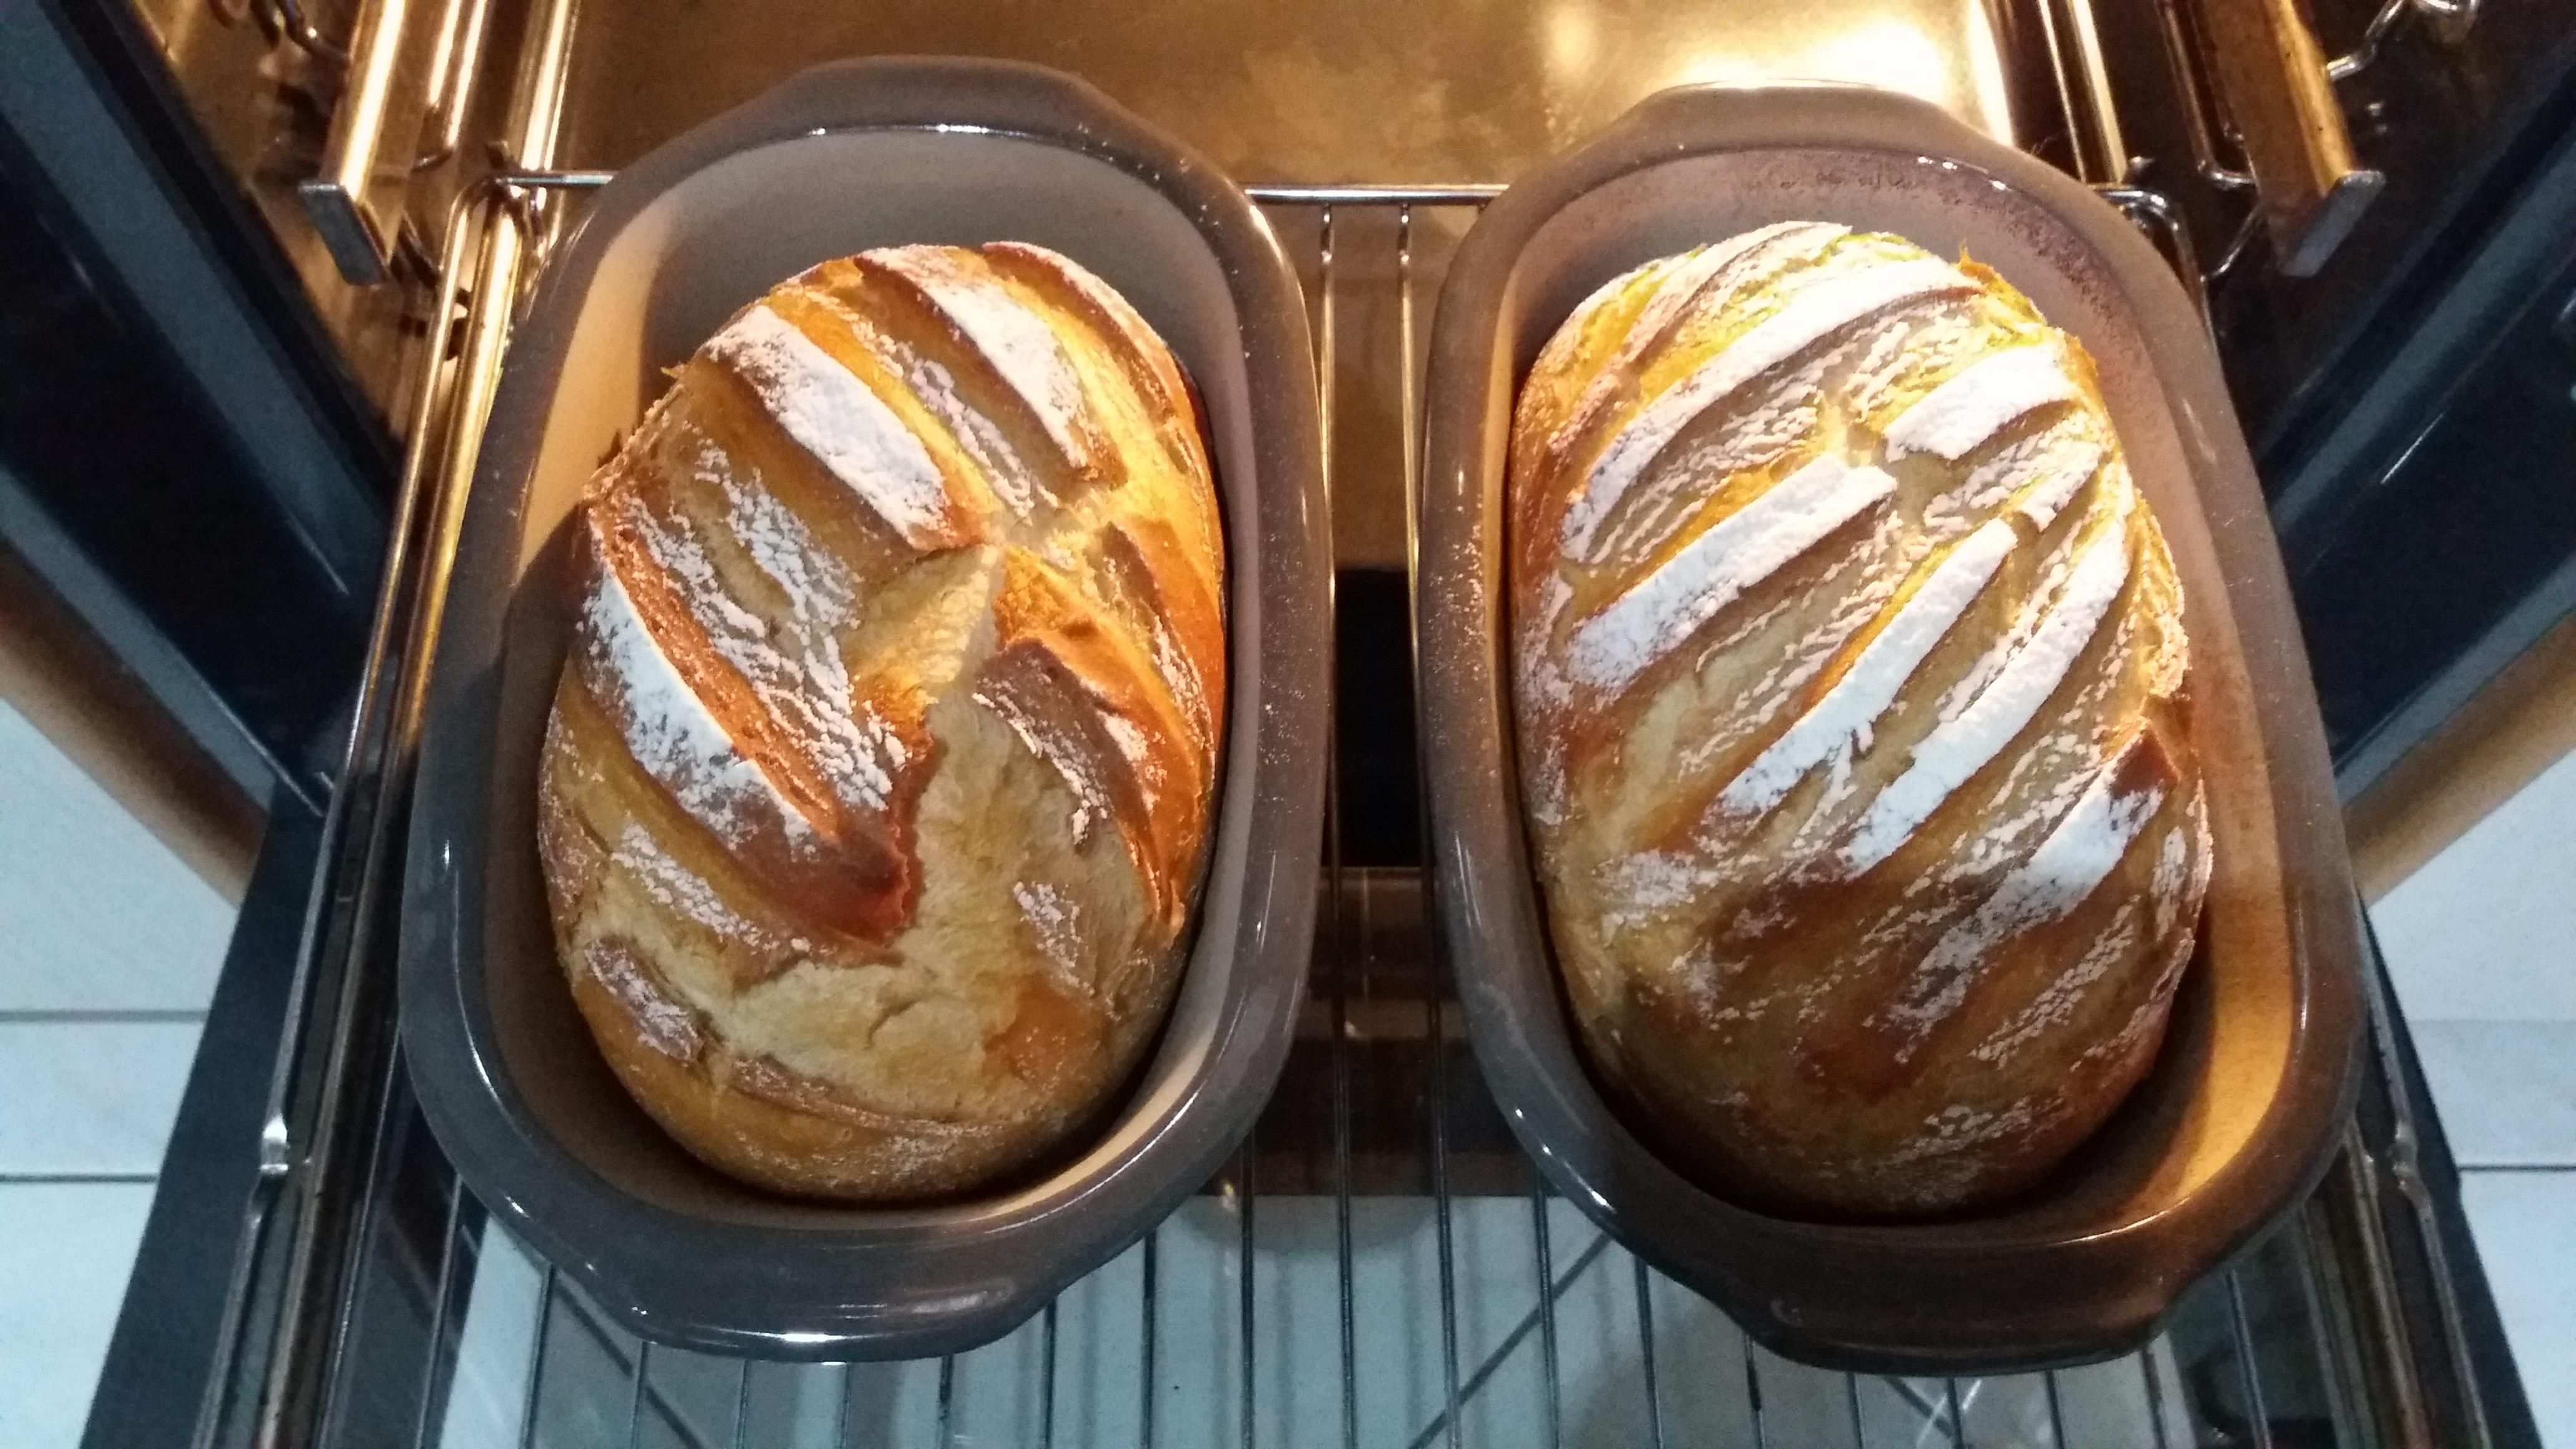 See Krustchen Rezept Brot Selber Backen Rezept Brot Backen Rezept Einfach Brot Backen Einfach